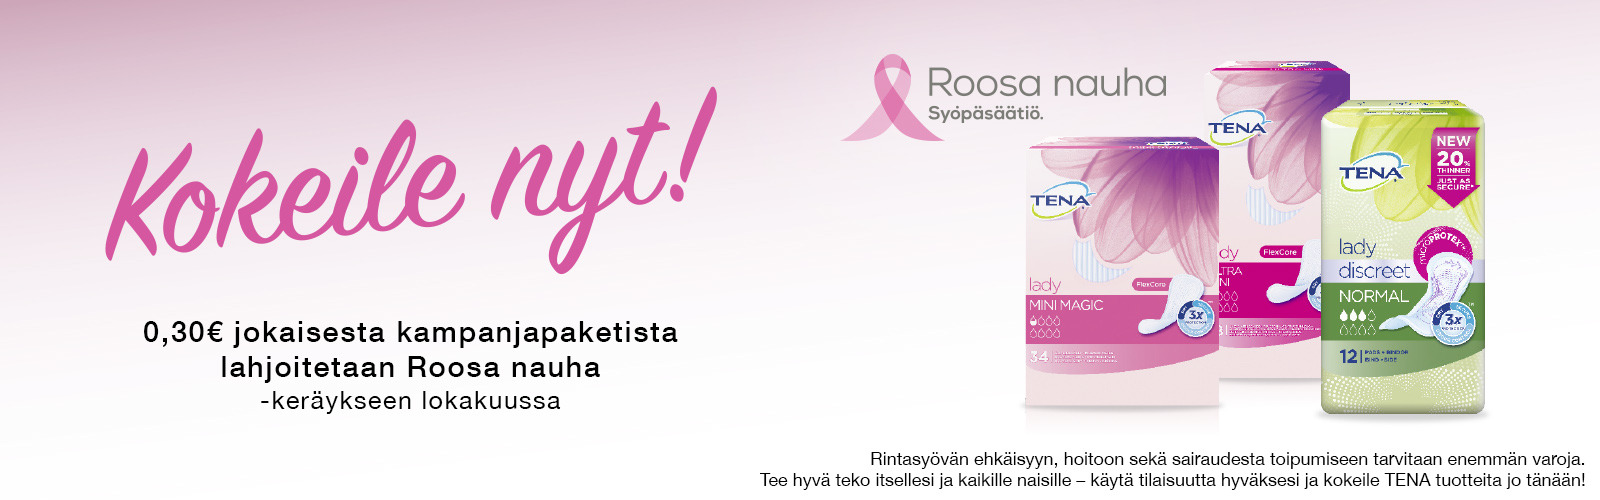 TENA Lady tukee Roosa nauha -kampanjaa